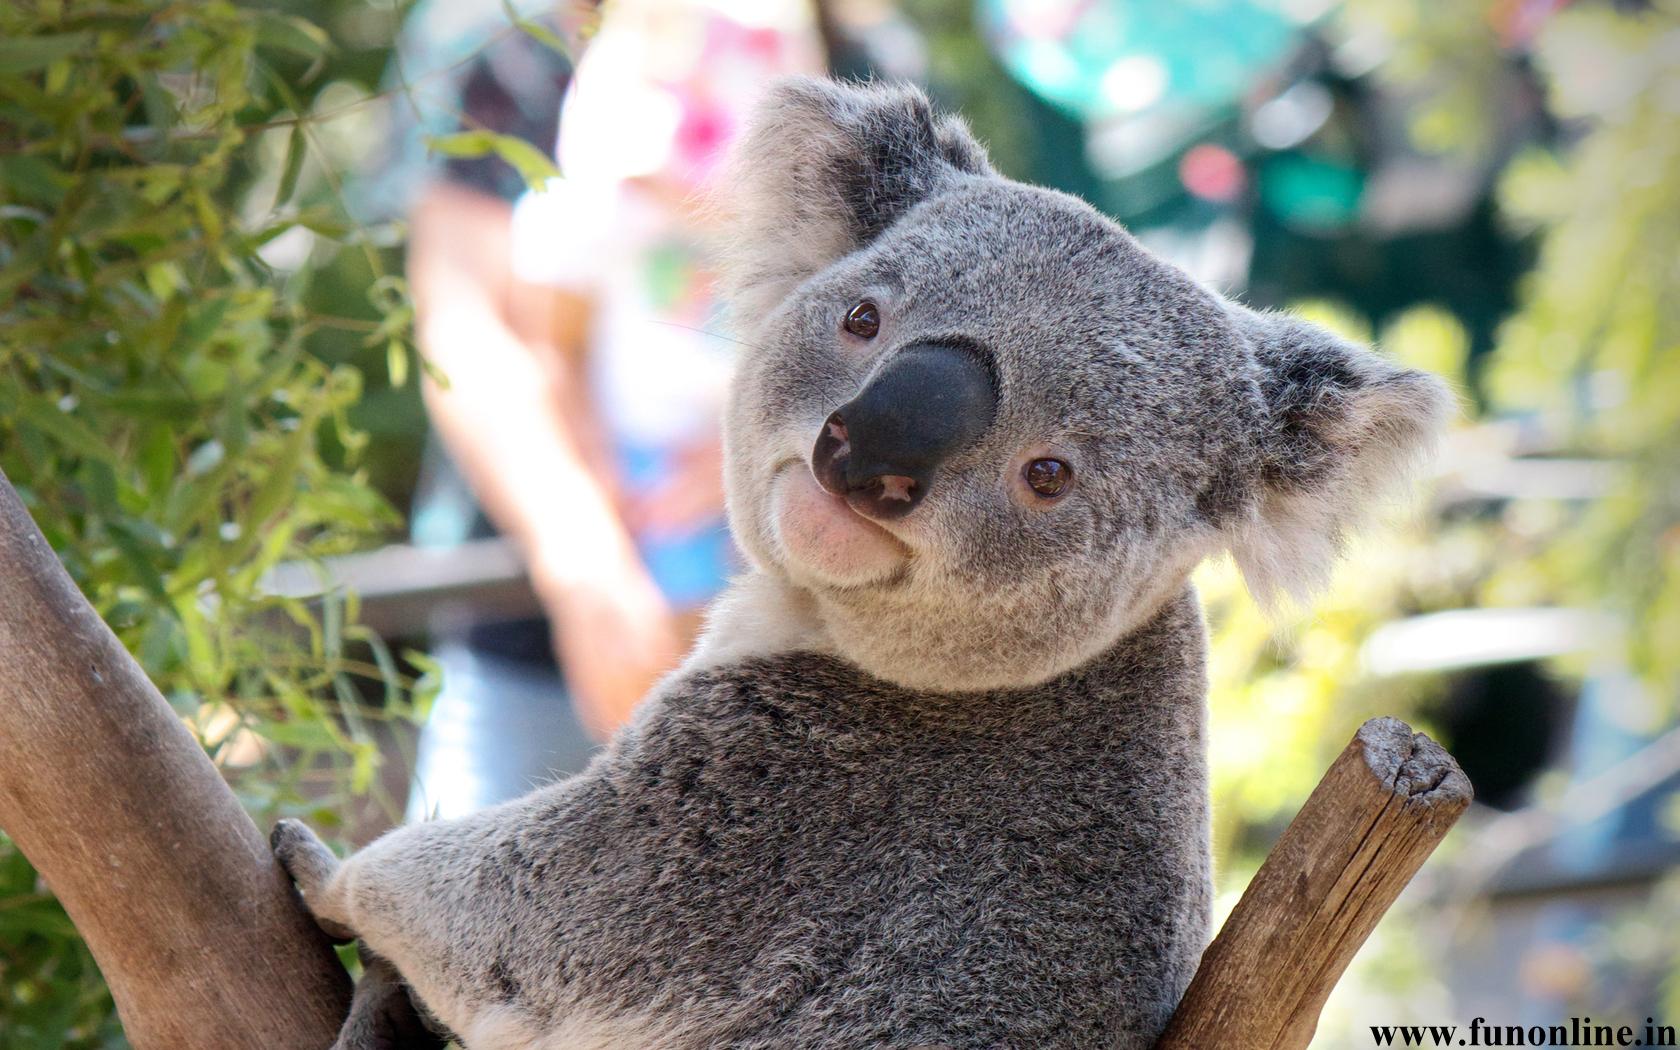 Cute Baby Koala Wallpaper - WallpaperSafari